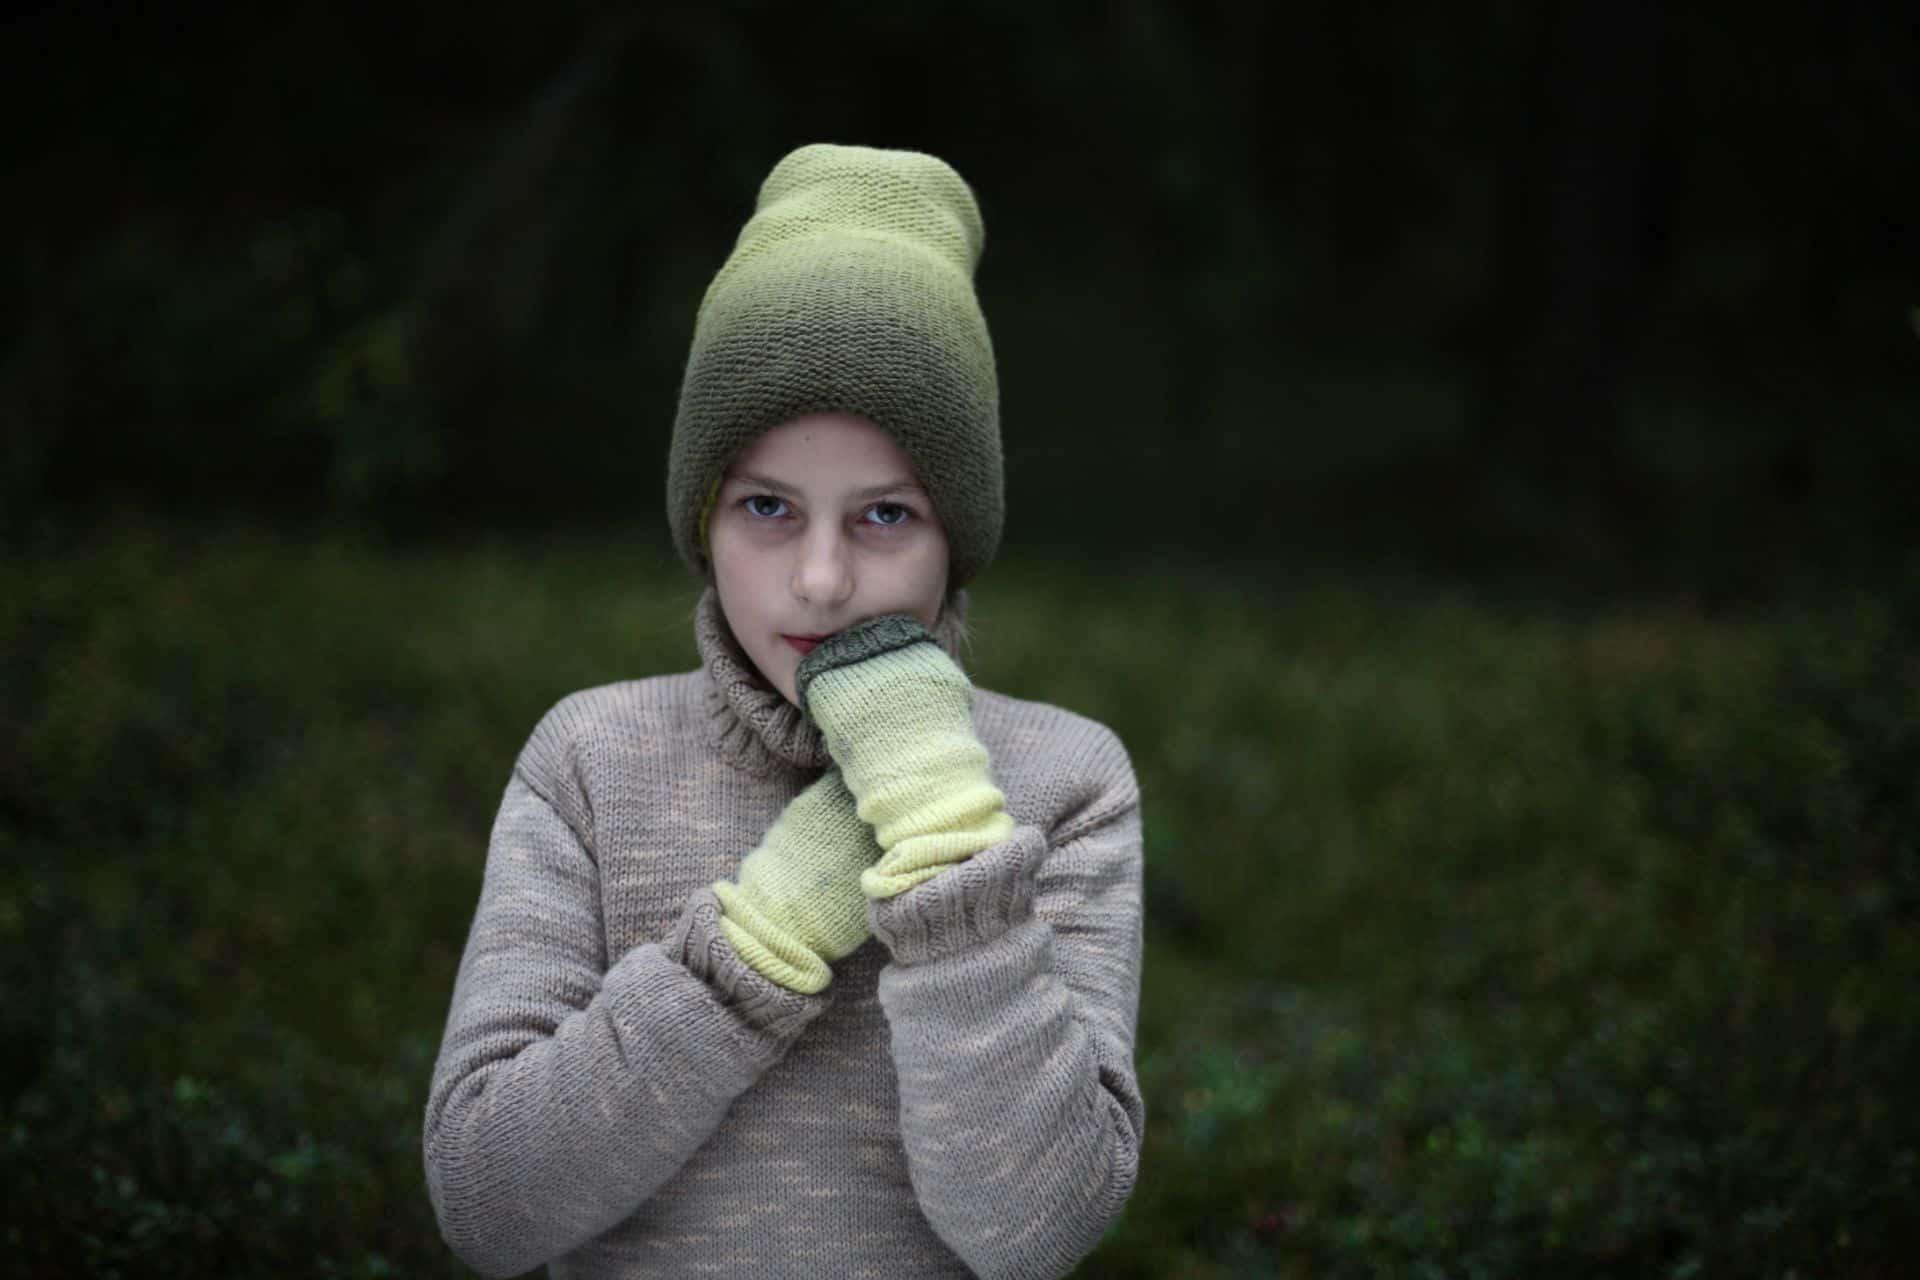 handmade textile hat, wrist warmers